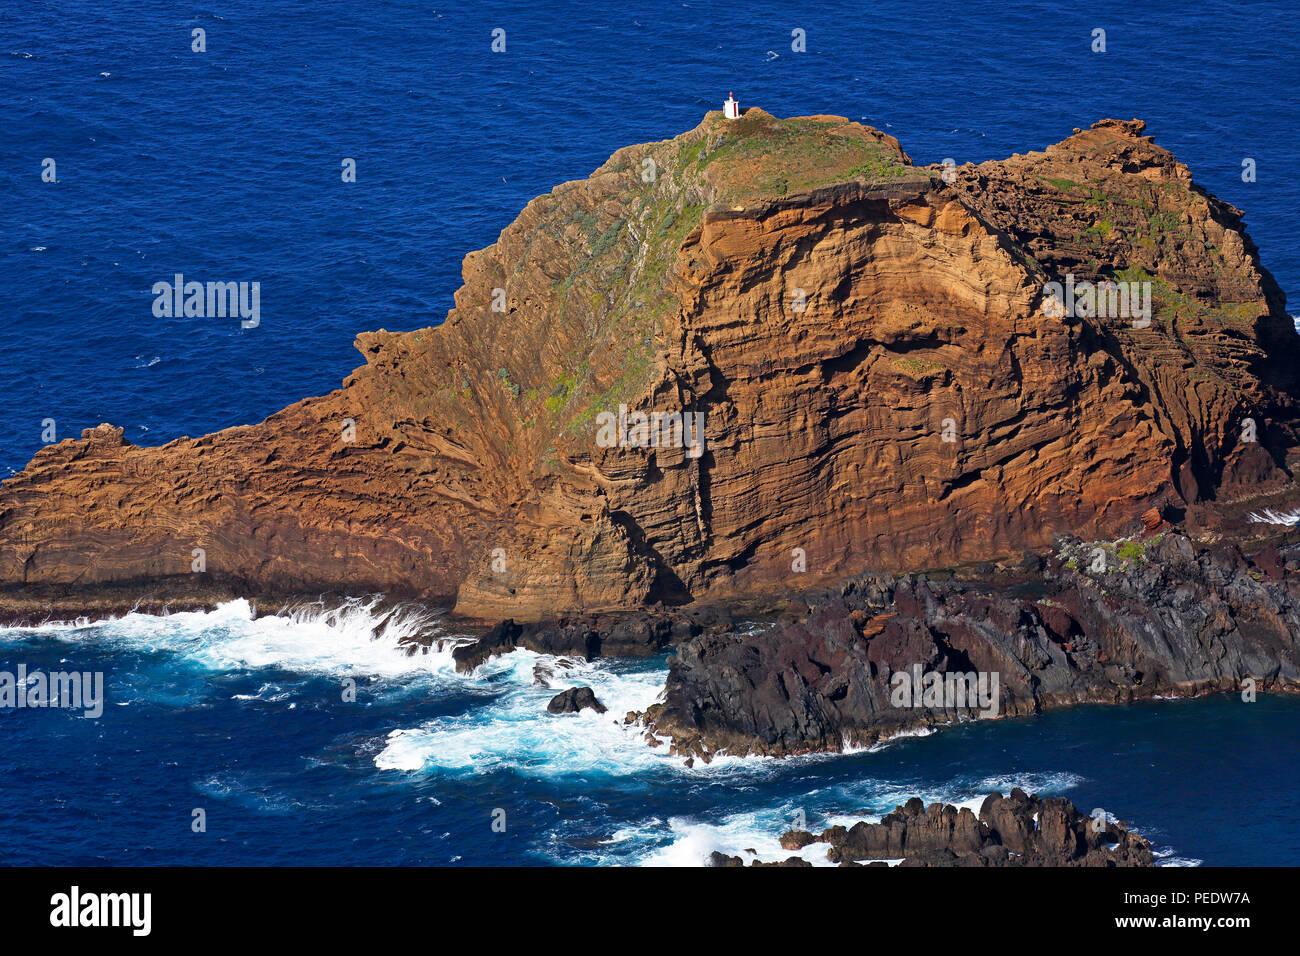 Lavaklippen mit kleinem Leuchtfeuer, Porto Moniz, Nordkueste Madeira, Portugal - Stock Image